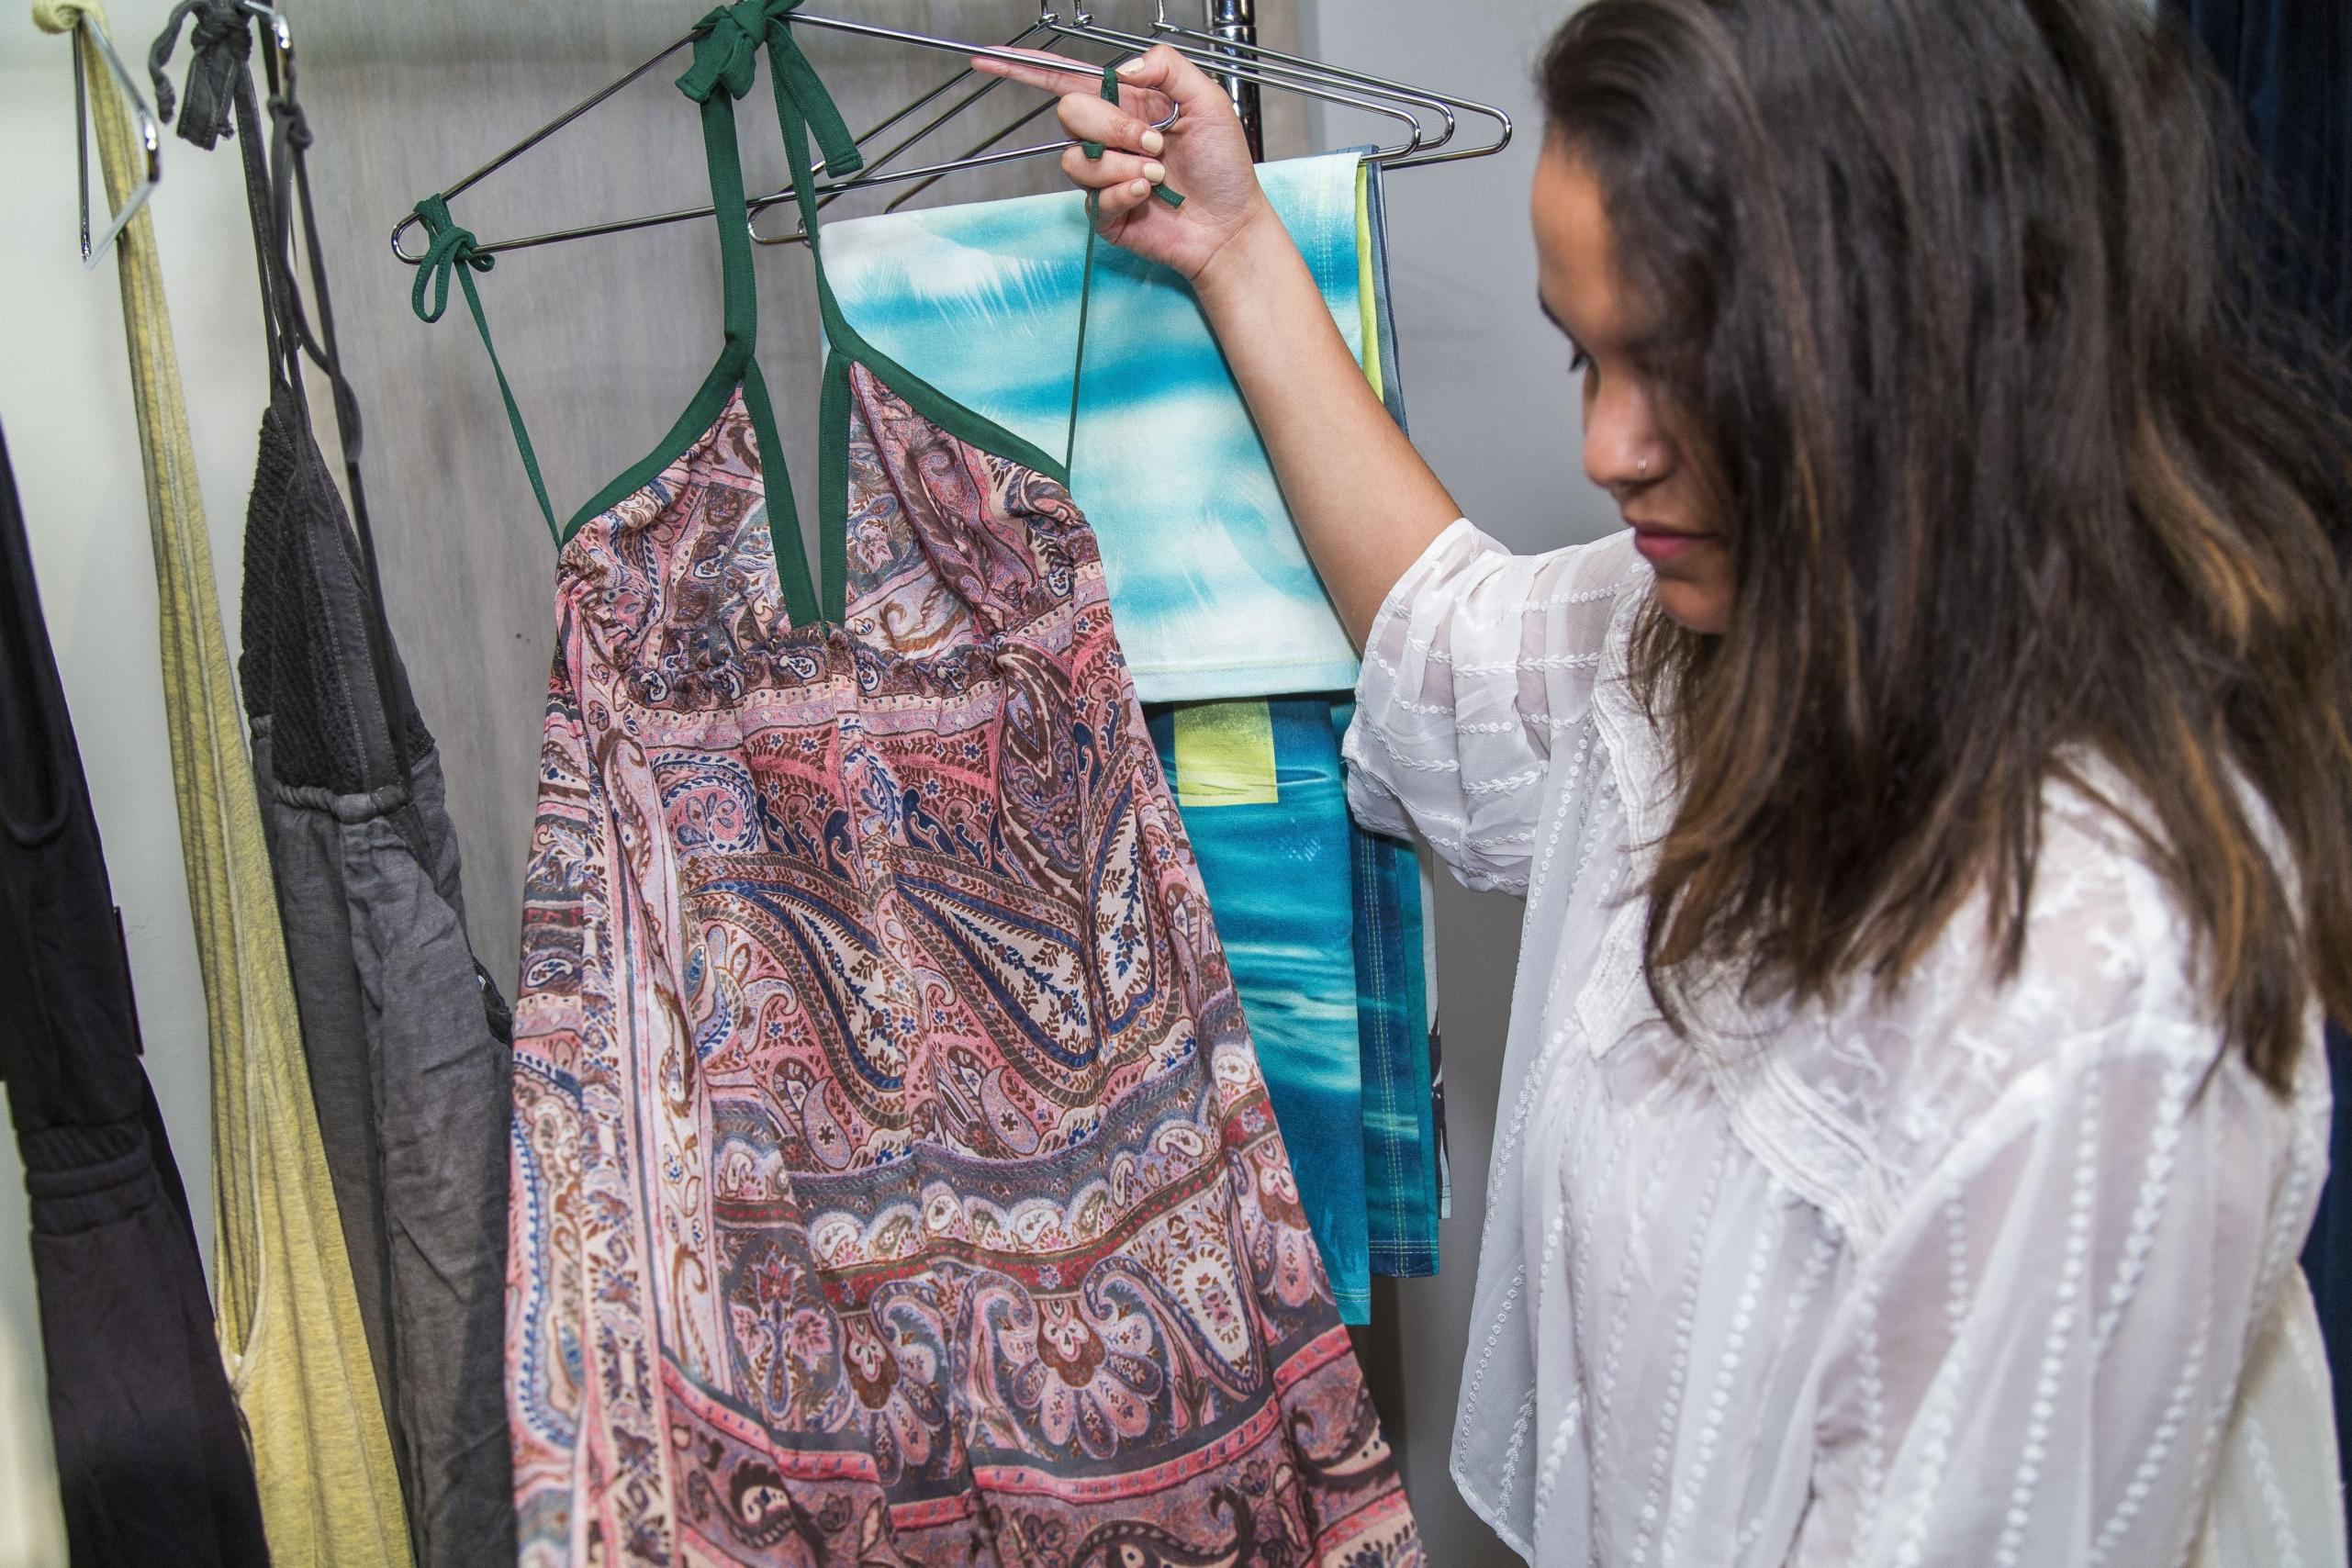 Lifestyle Brand Kimoa Lauches Southern California Beach Style Collection